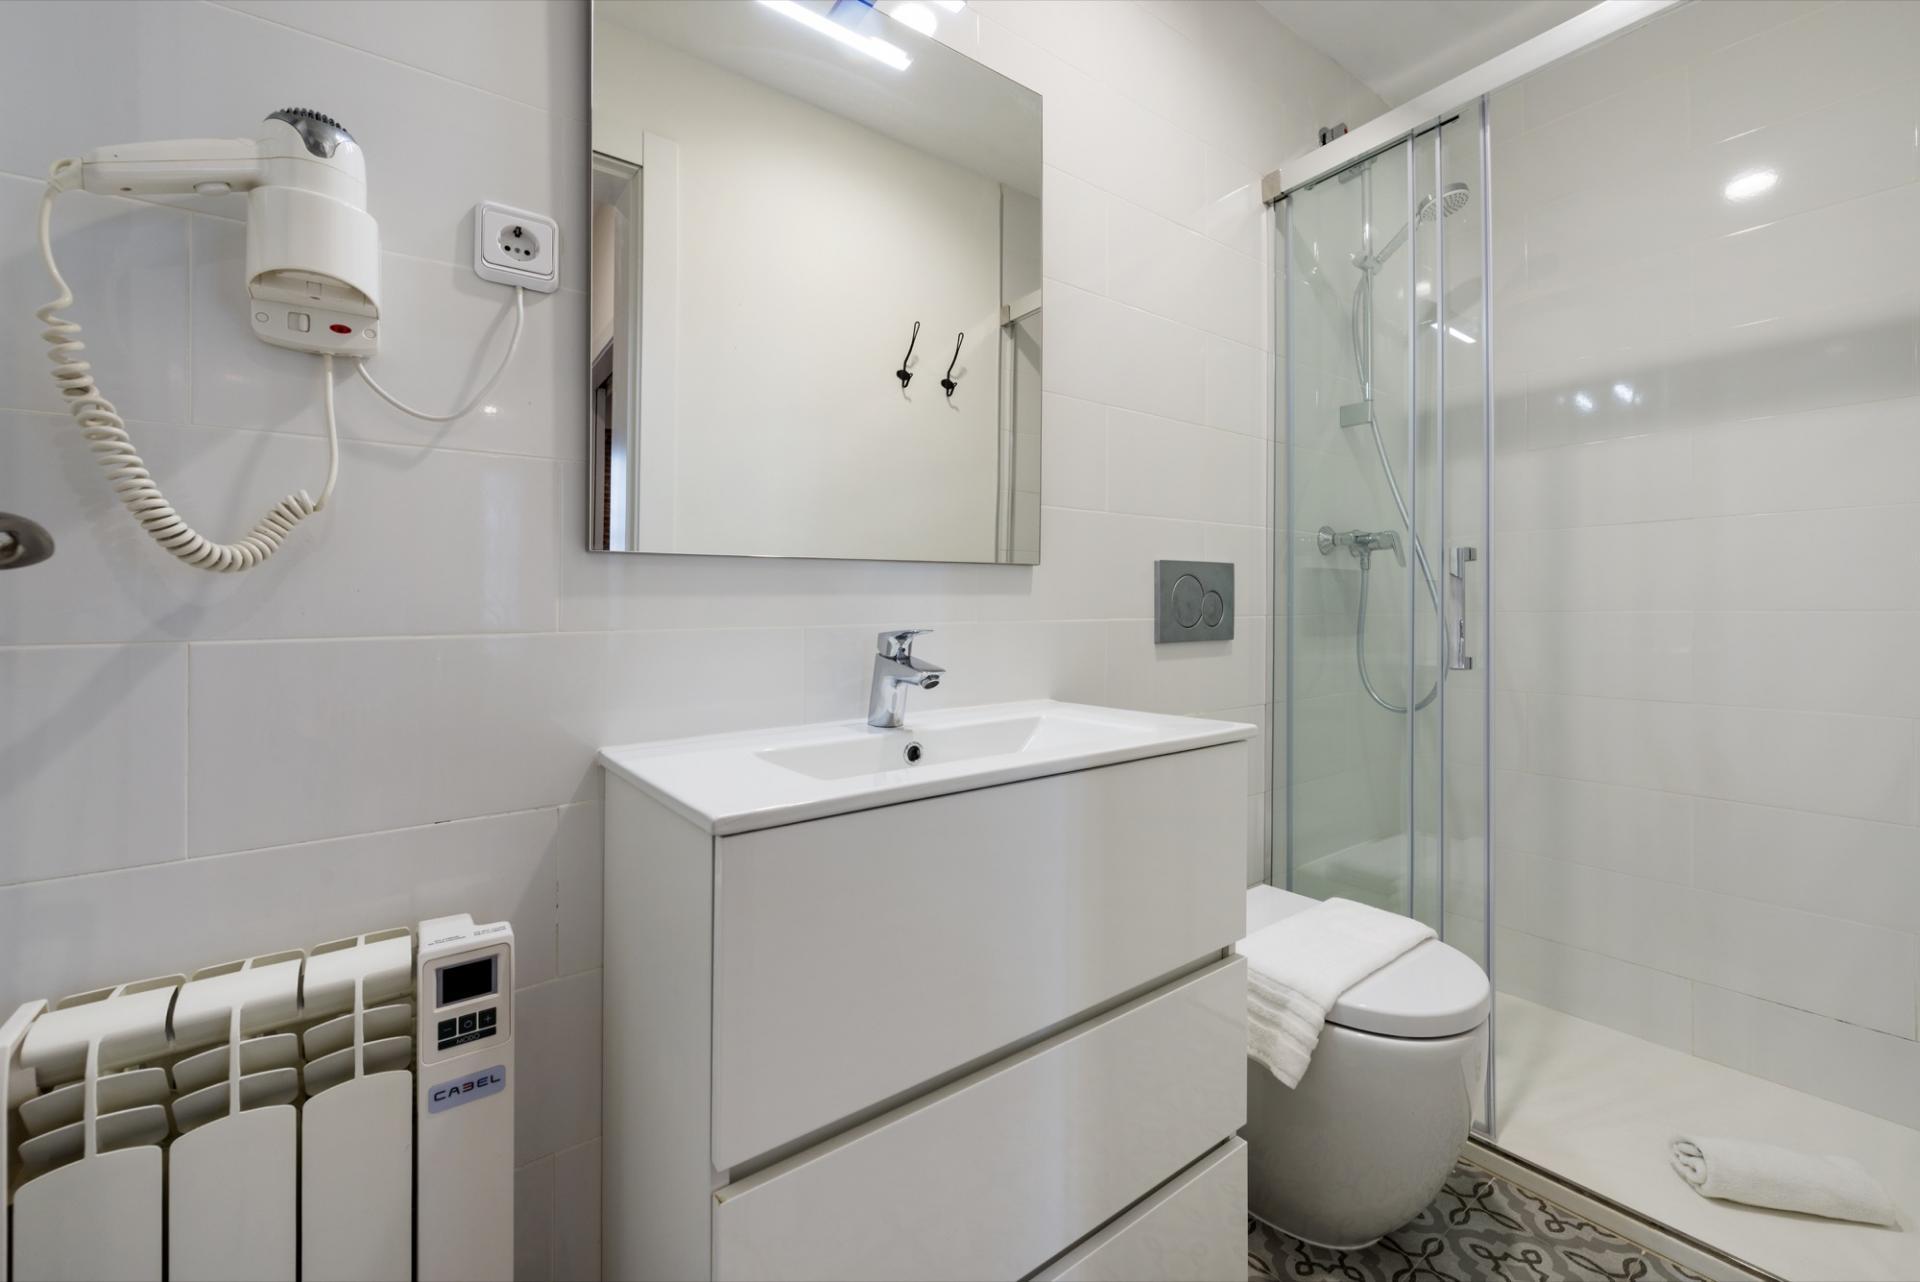 Shower at Pelayo Suites, El Raval, Barcelona - Citybase Apartments